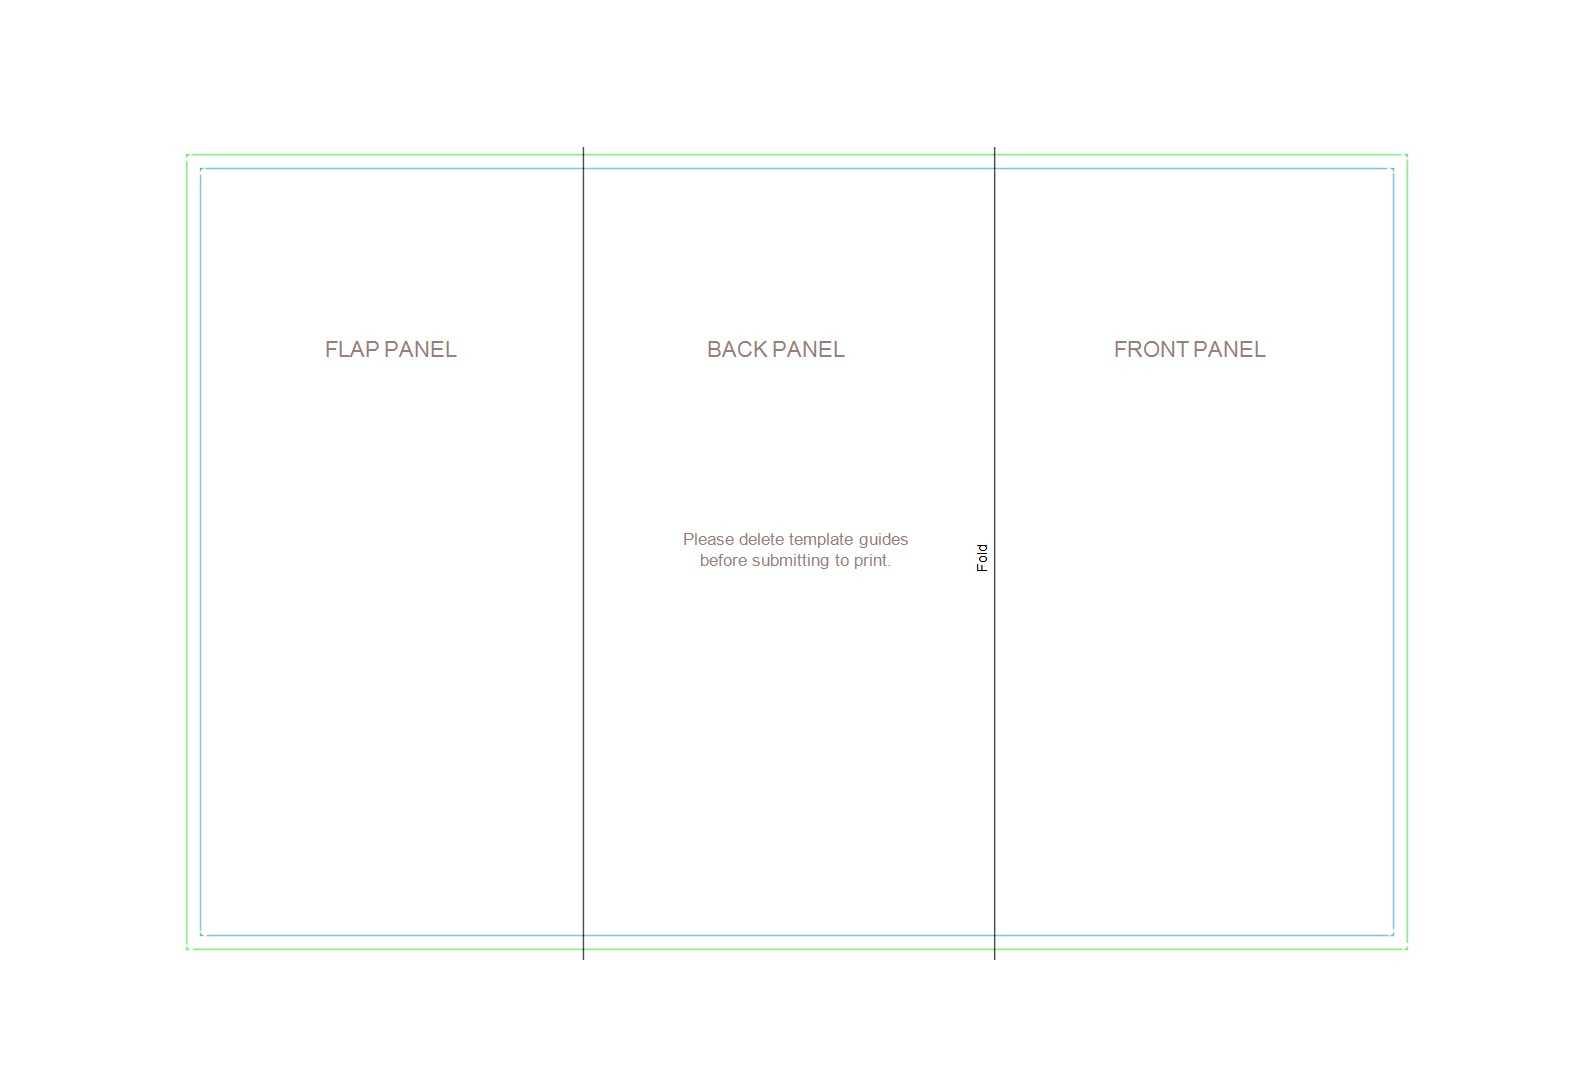 50 Free Pamphlet Templates [Word / Google Docs] ᐅ Templatelab With Google Docs Templates Brochure